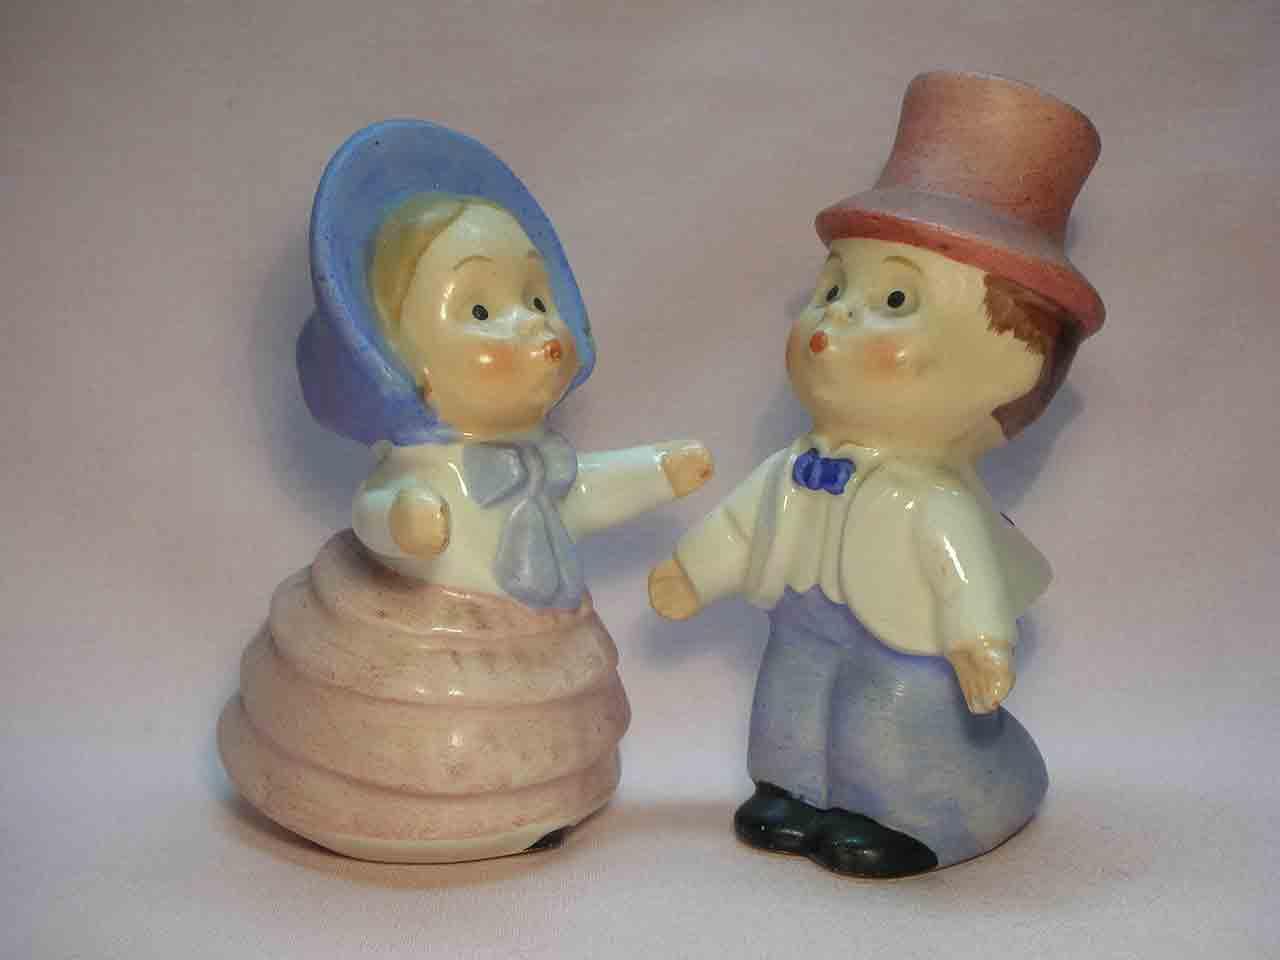 Goebel huggers salt and pepper shakers - Southern Couple